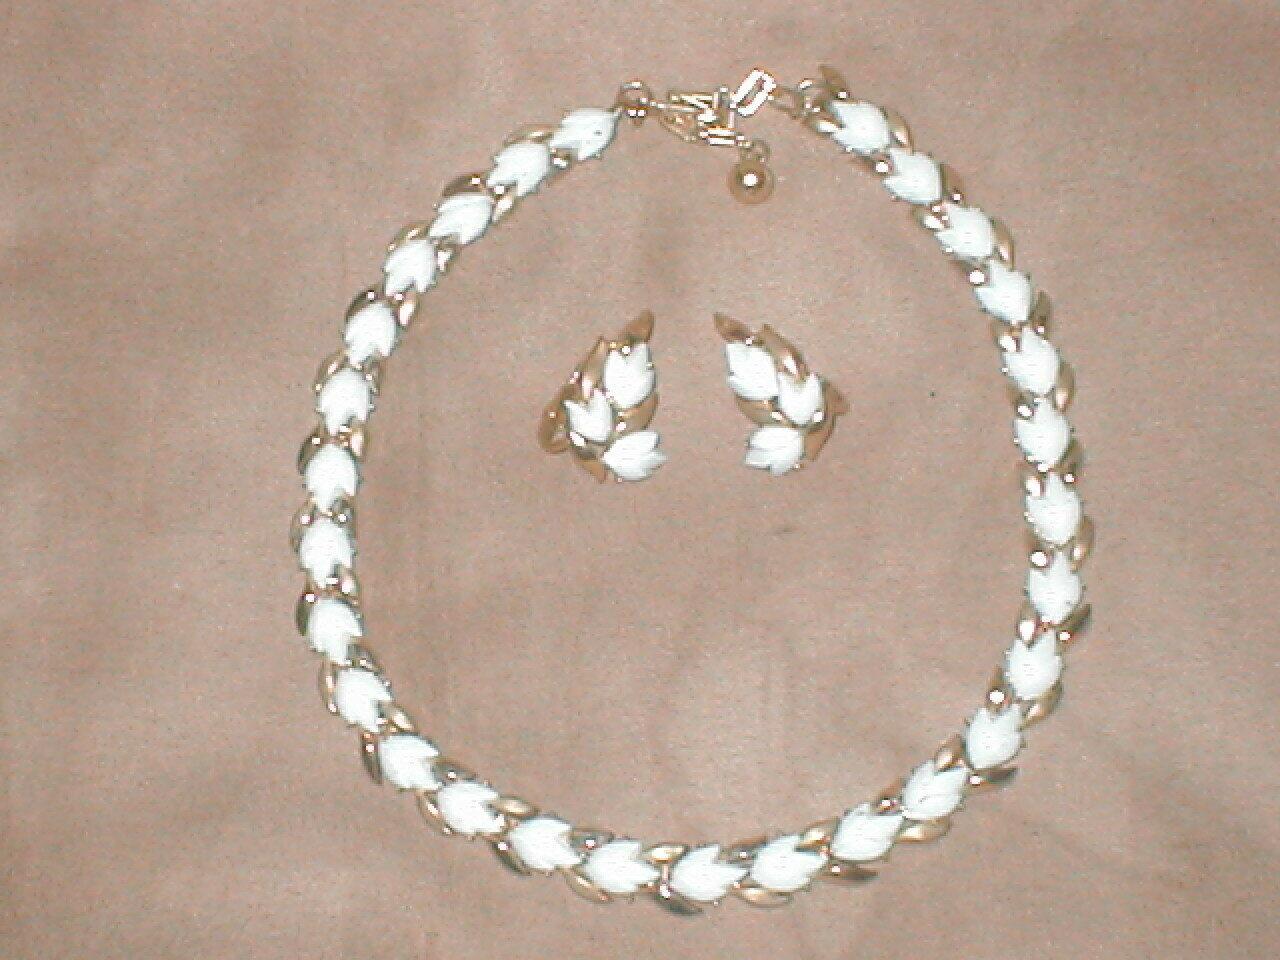 1950's Vintage CROWN TRIFARI signed Milk Glass Necklace & Earrings Set - $87.12